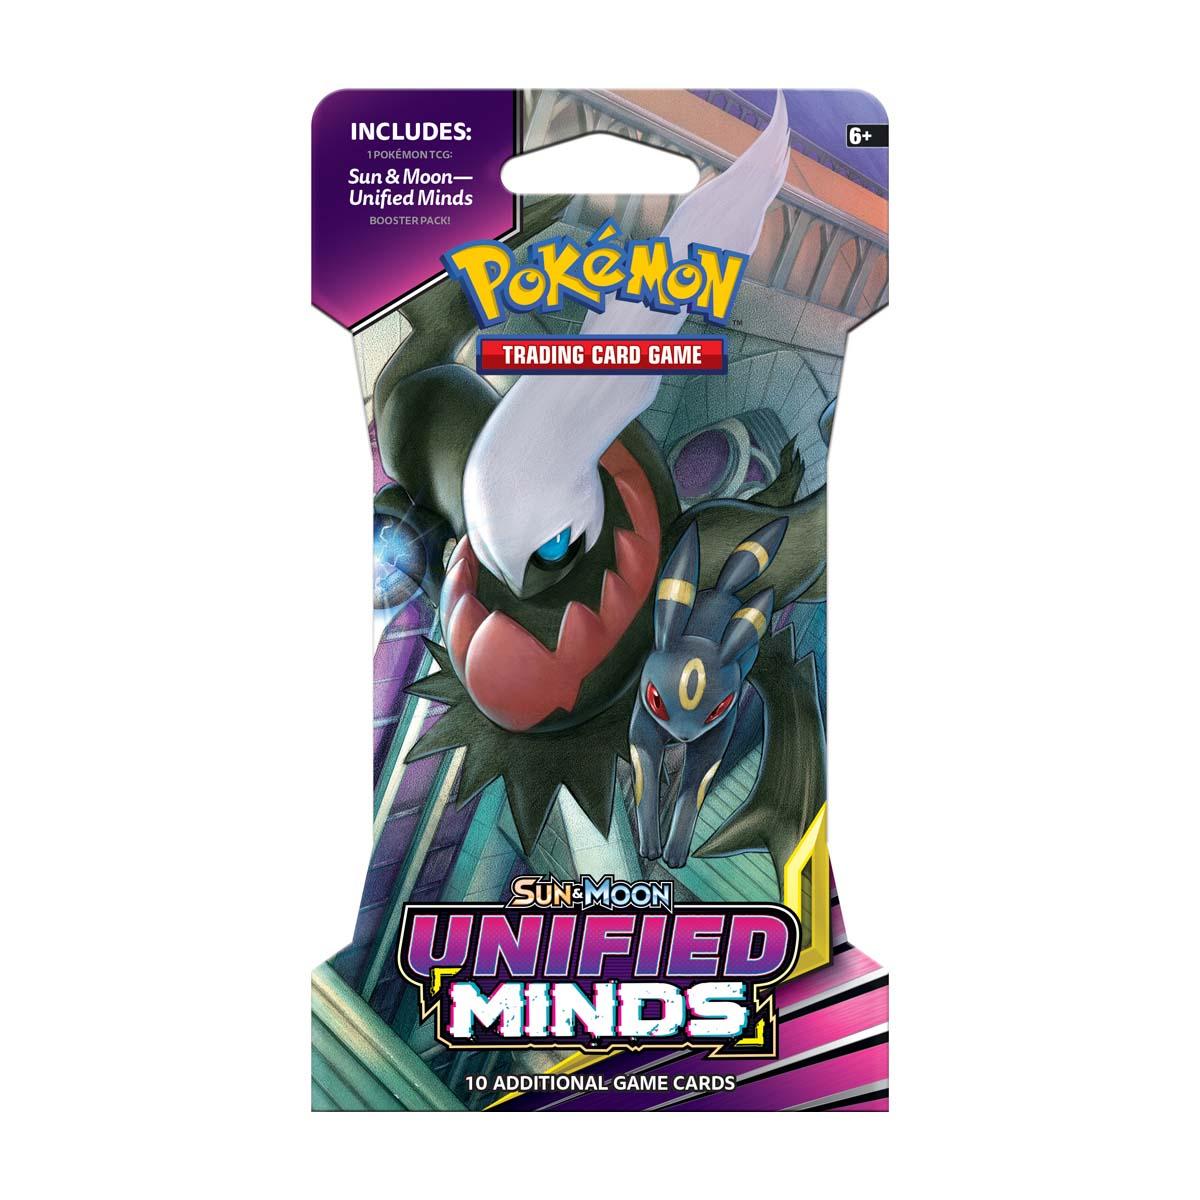 Afbeelding van Pokémon Sun & Moon U Minds Sleeved Booster